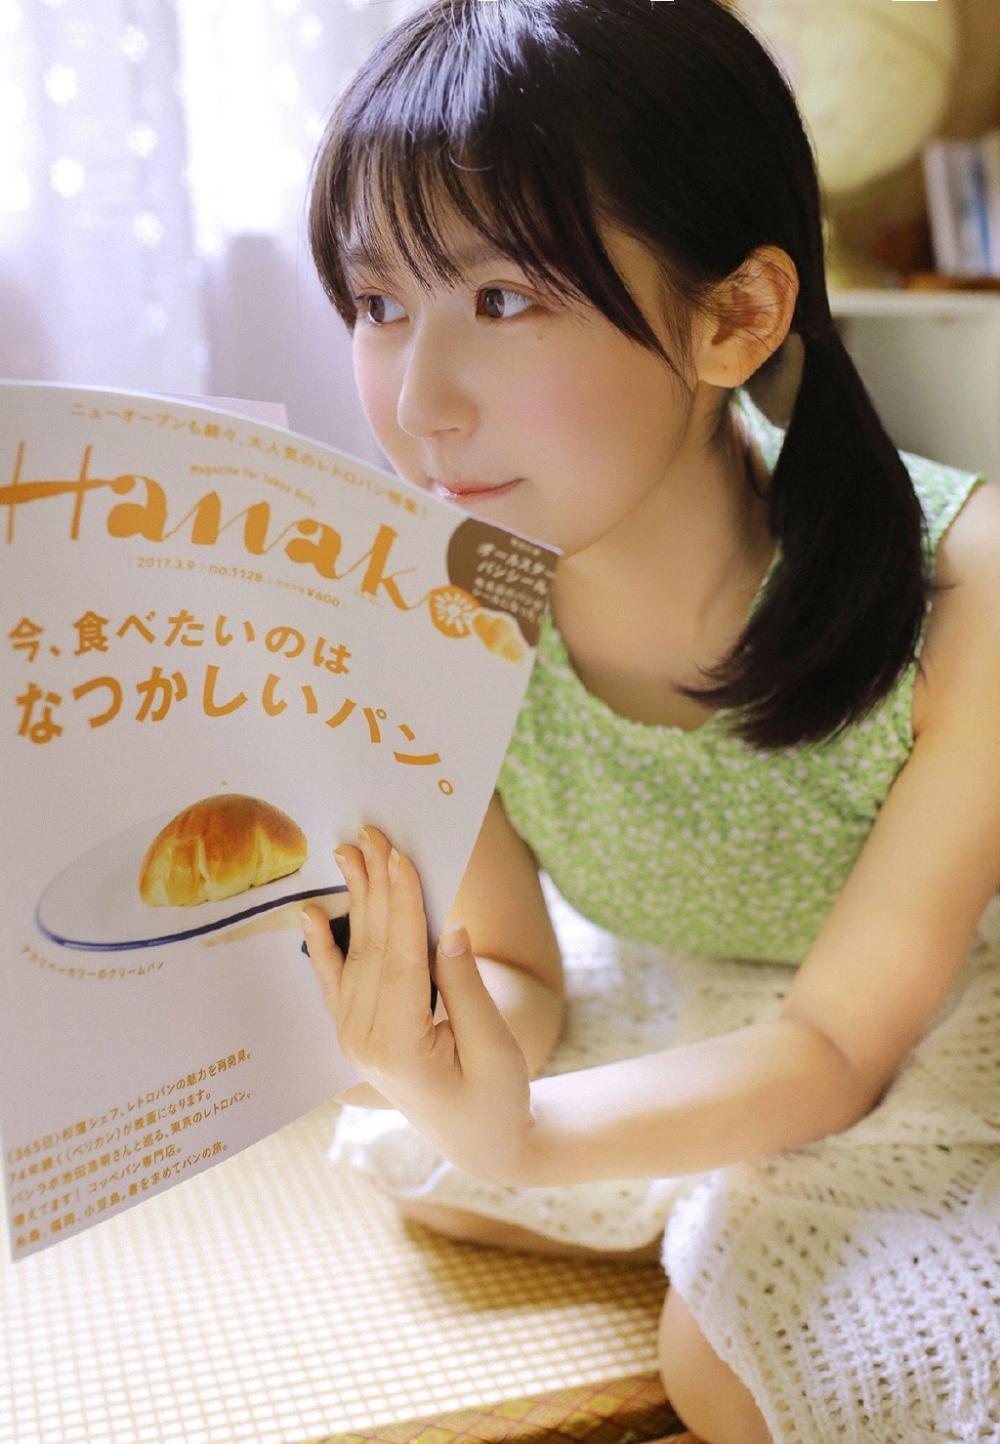 5ONE-503日本女孩纯情可爱美女模特居家白丝美腿自拍生活照片